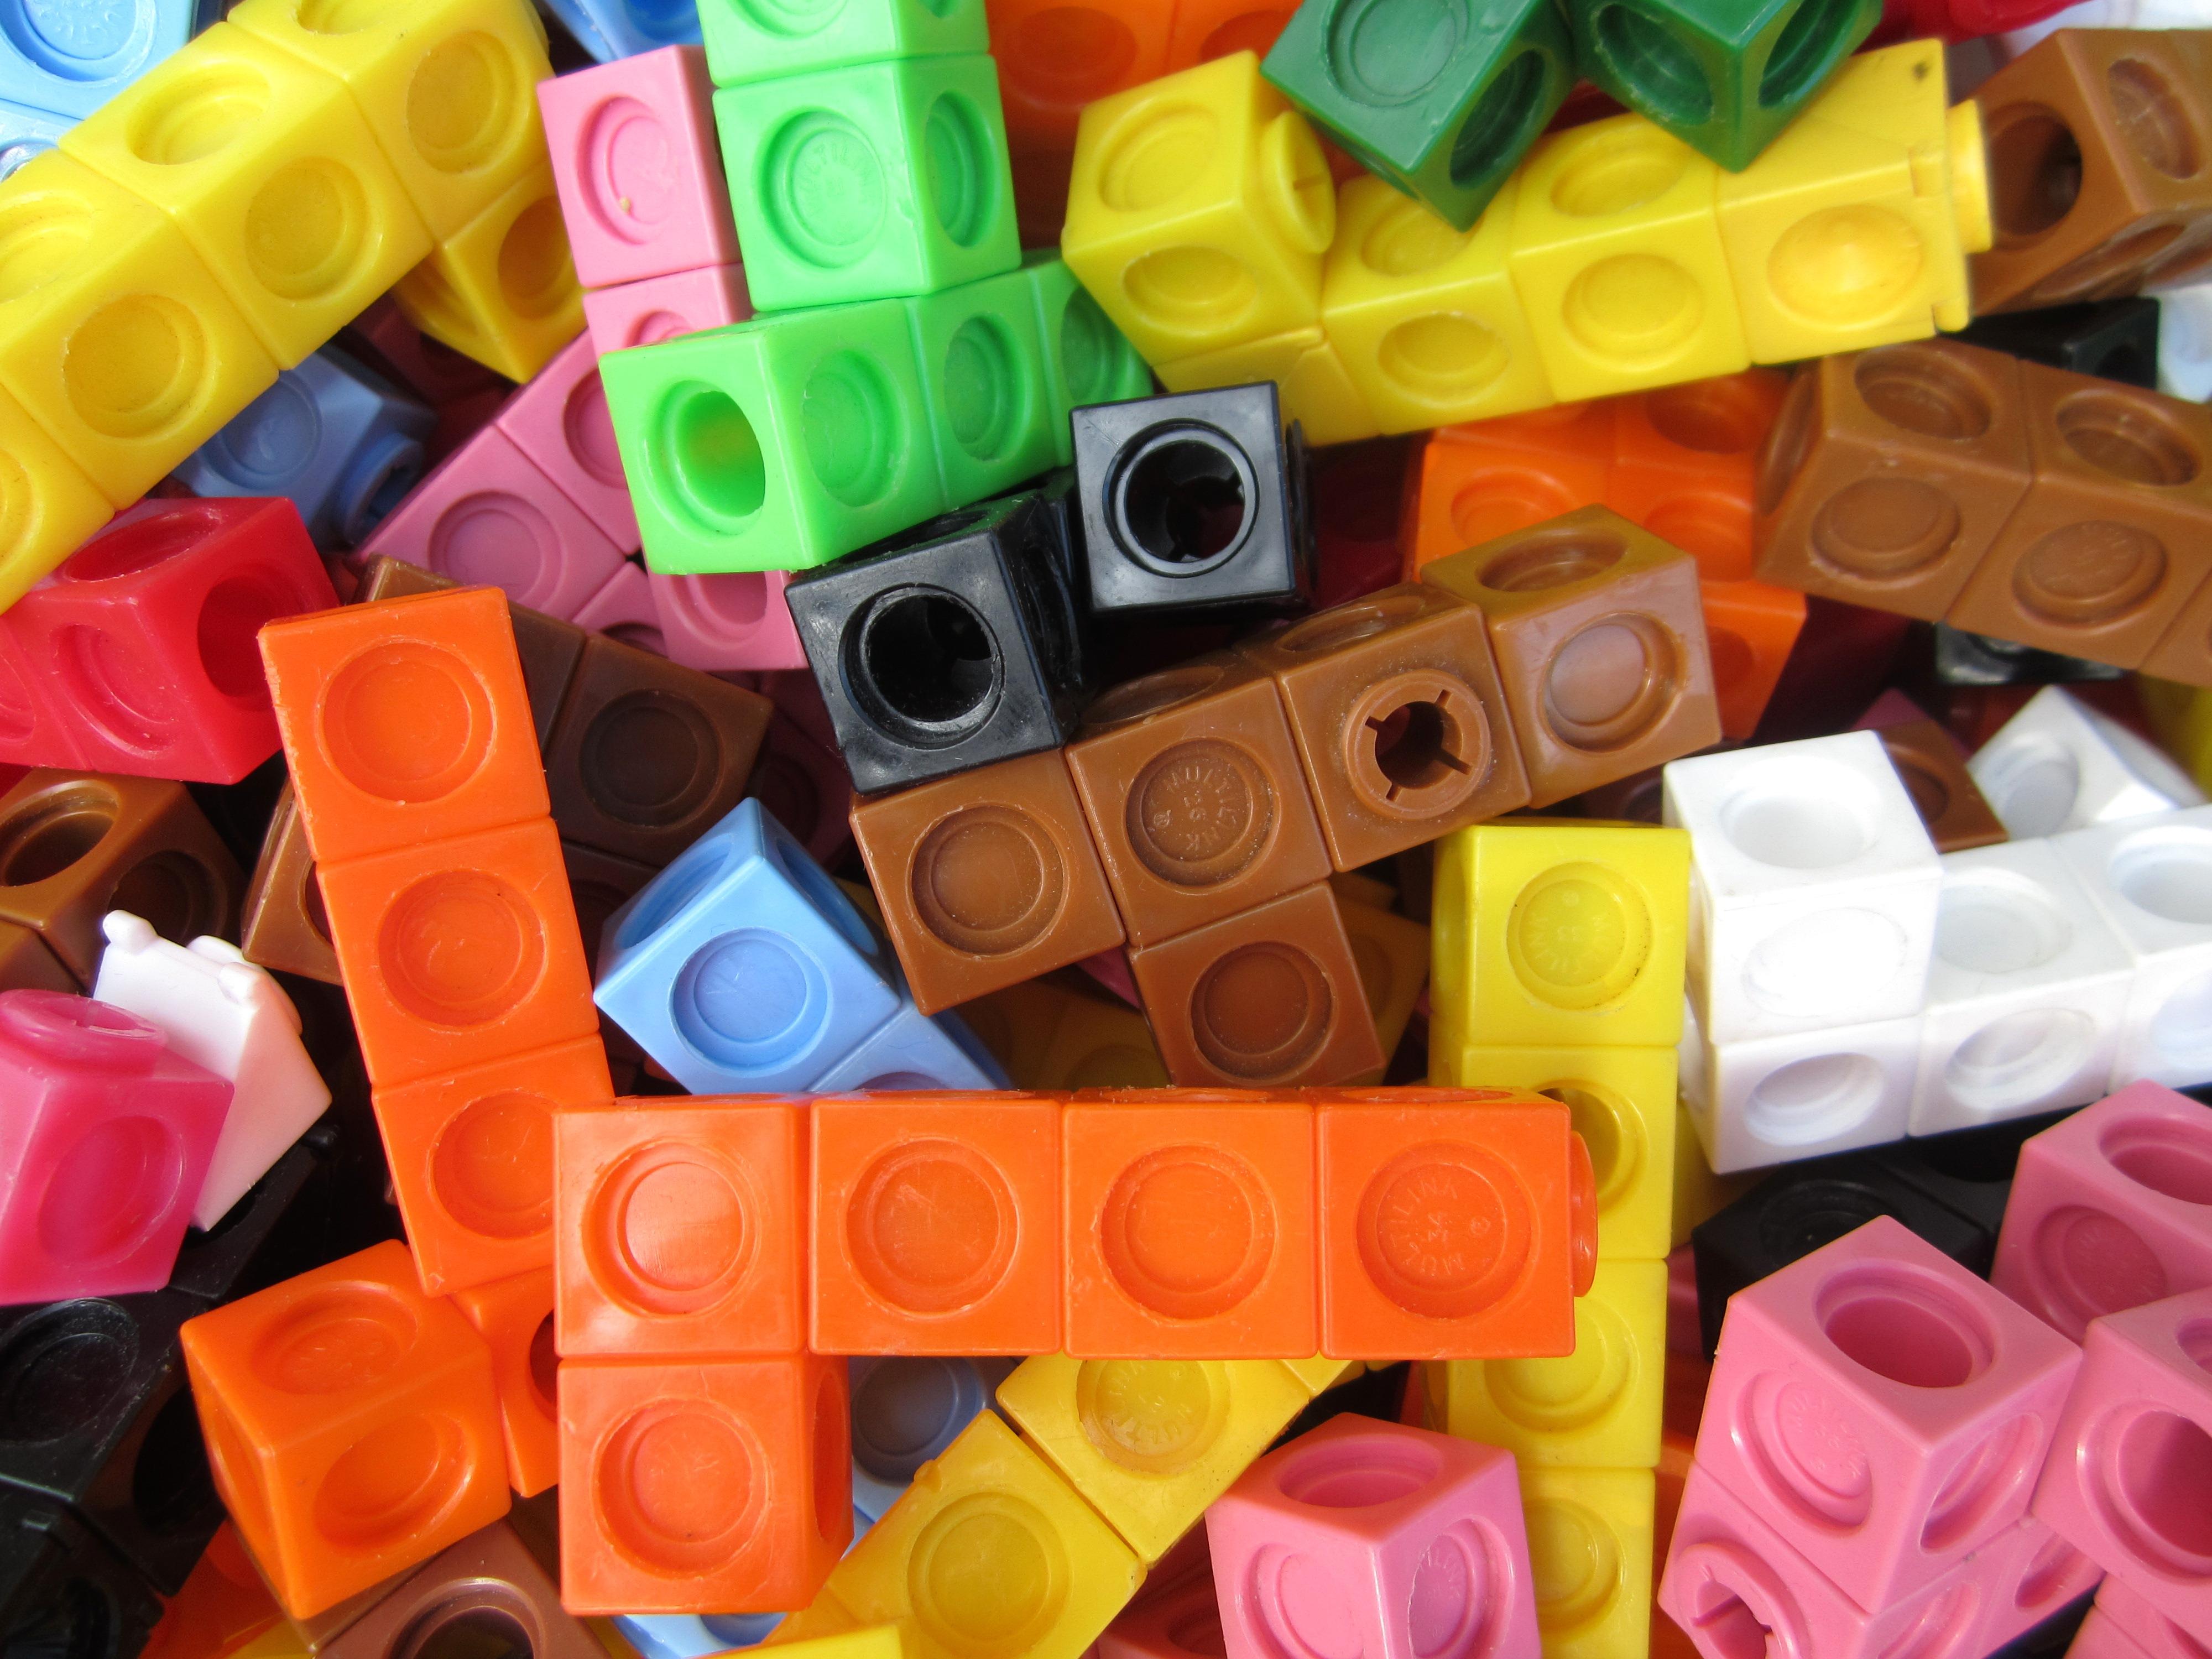 https://i0.wp.com/upload.wikimedia.org/wikipedia/commons/1/1c/Multilink_cubes.JPG